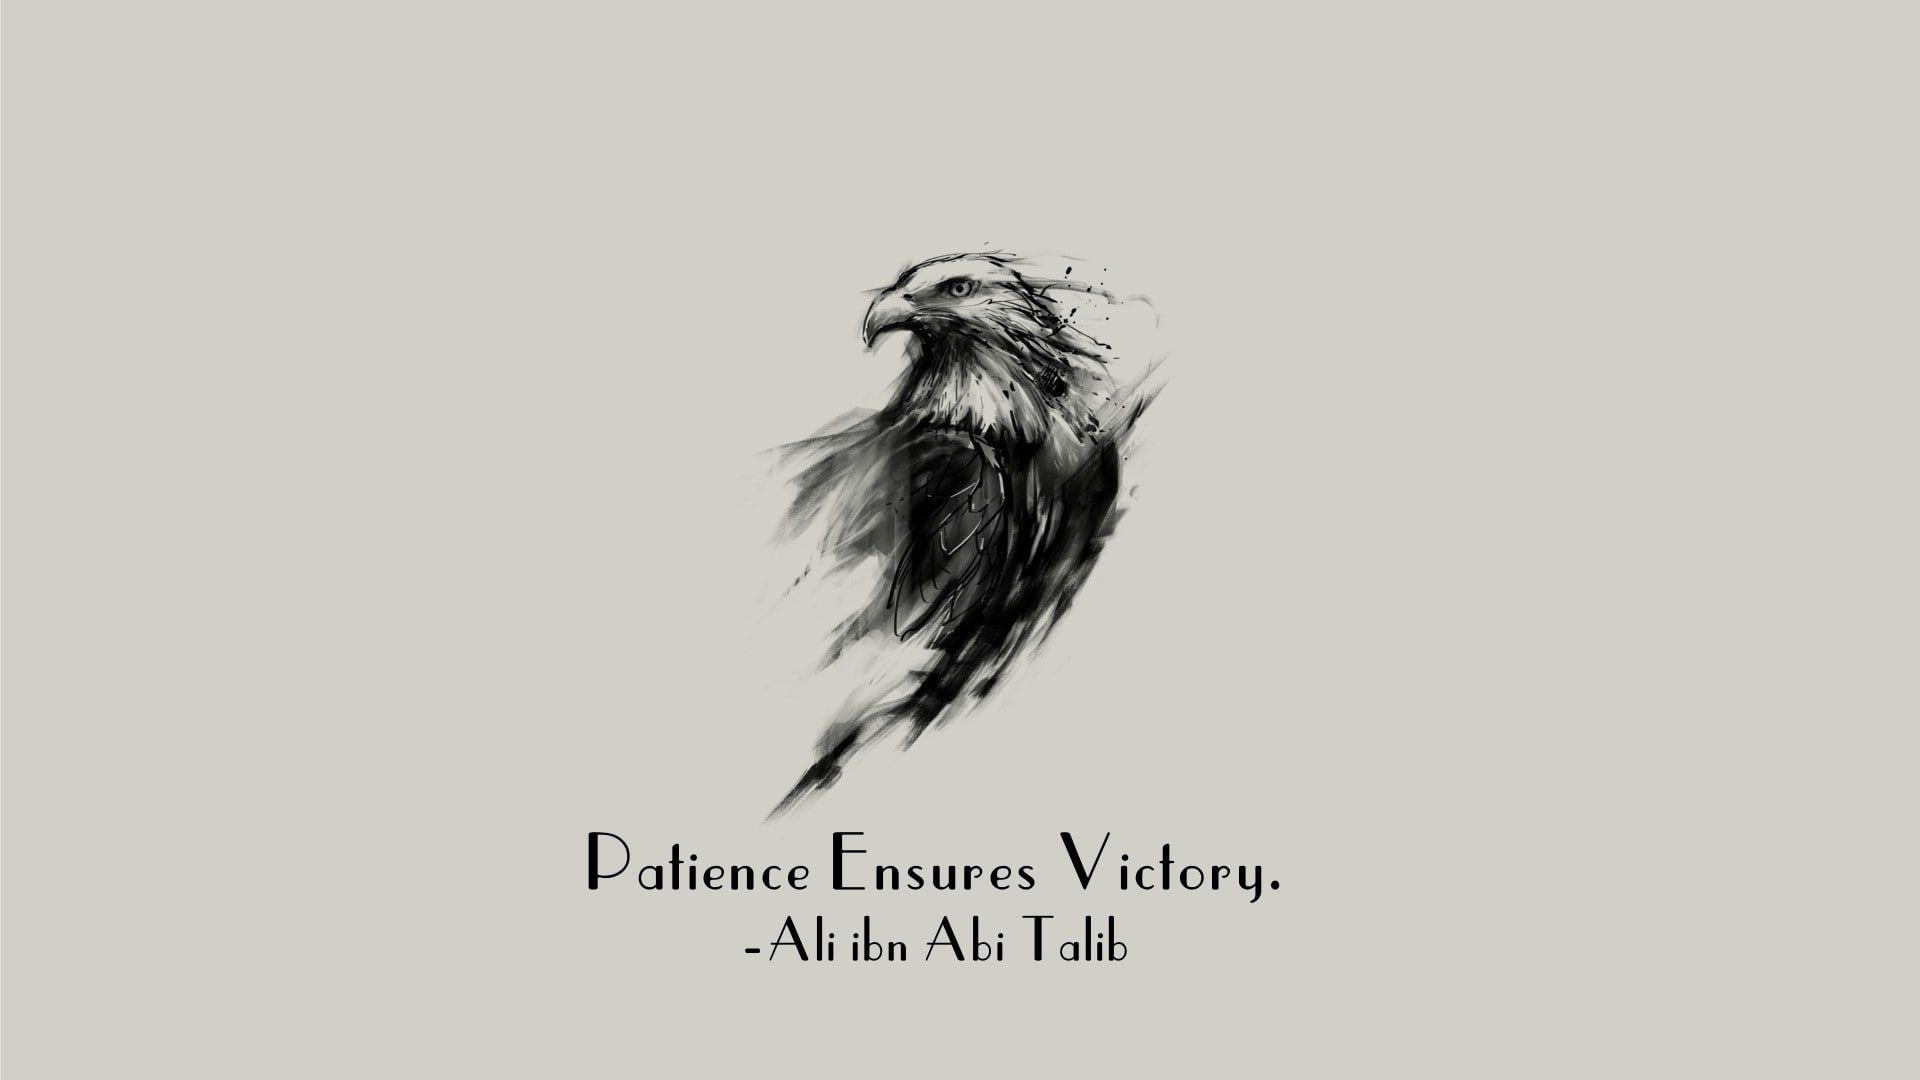 Imam Motivational Eagle Islam Quote Ali Ibn Abi Talib 1080p Wallpaper Hdwallpaper Desktop In 2020 Islamic Quotes Wallpaper Wallpaper Quotes Imam Ali